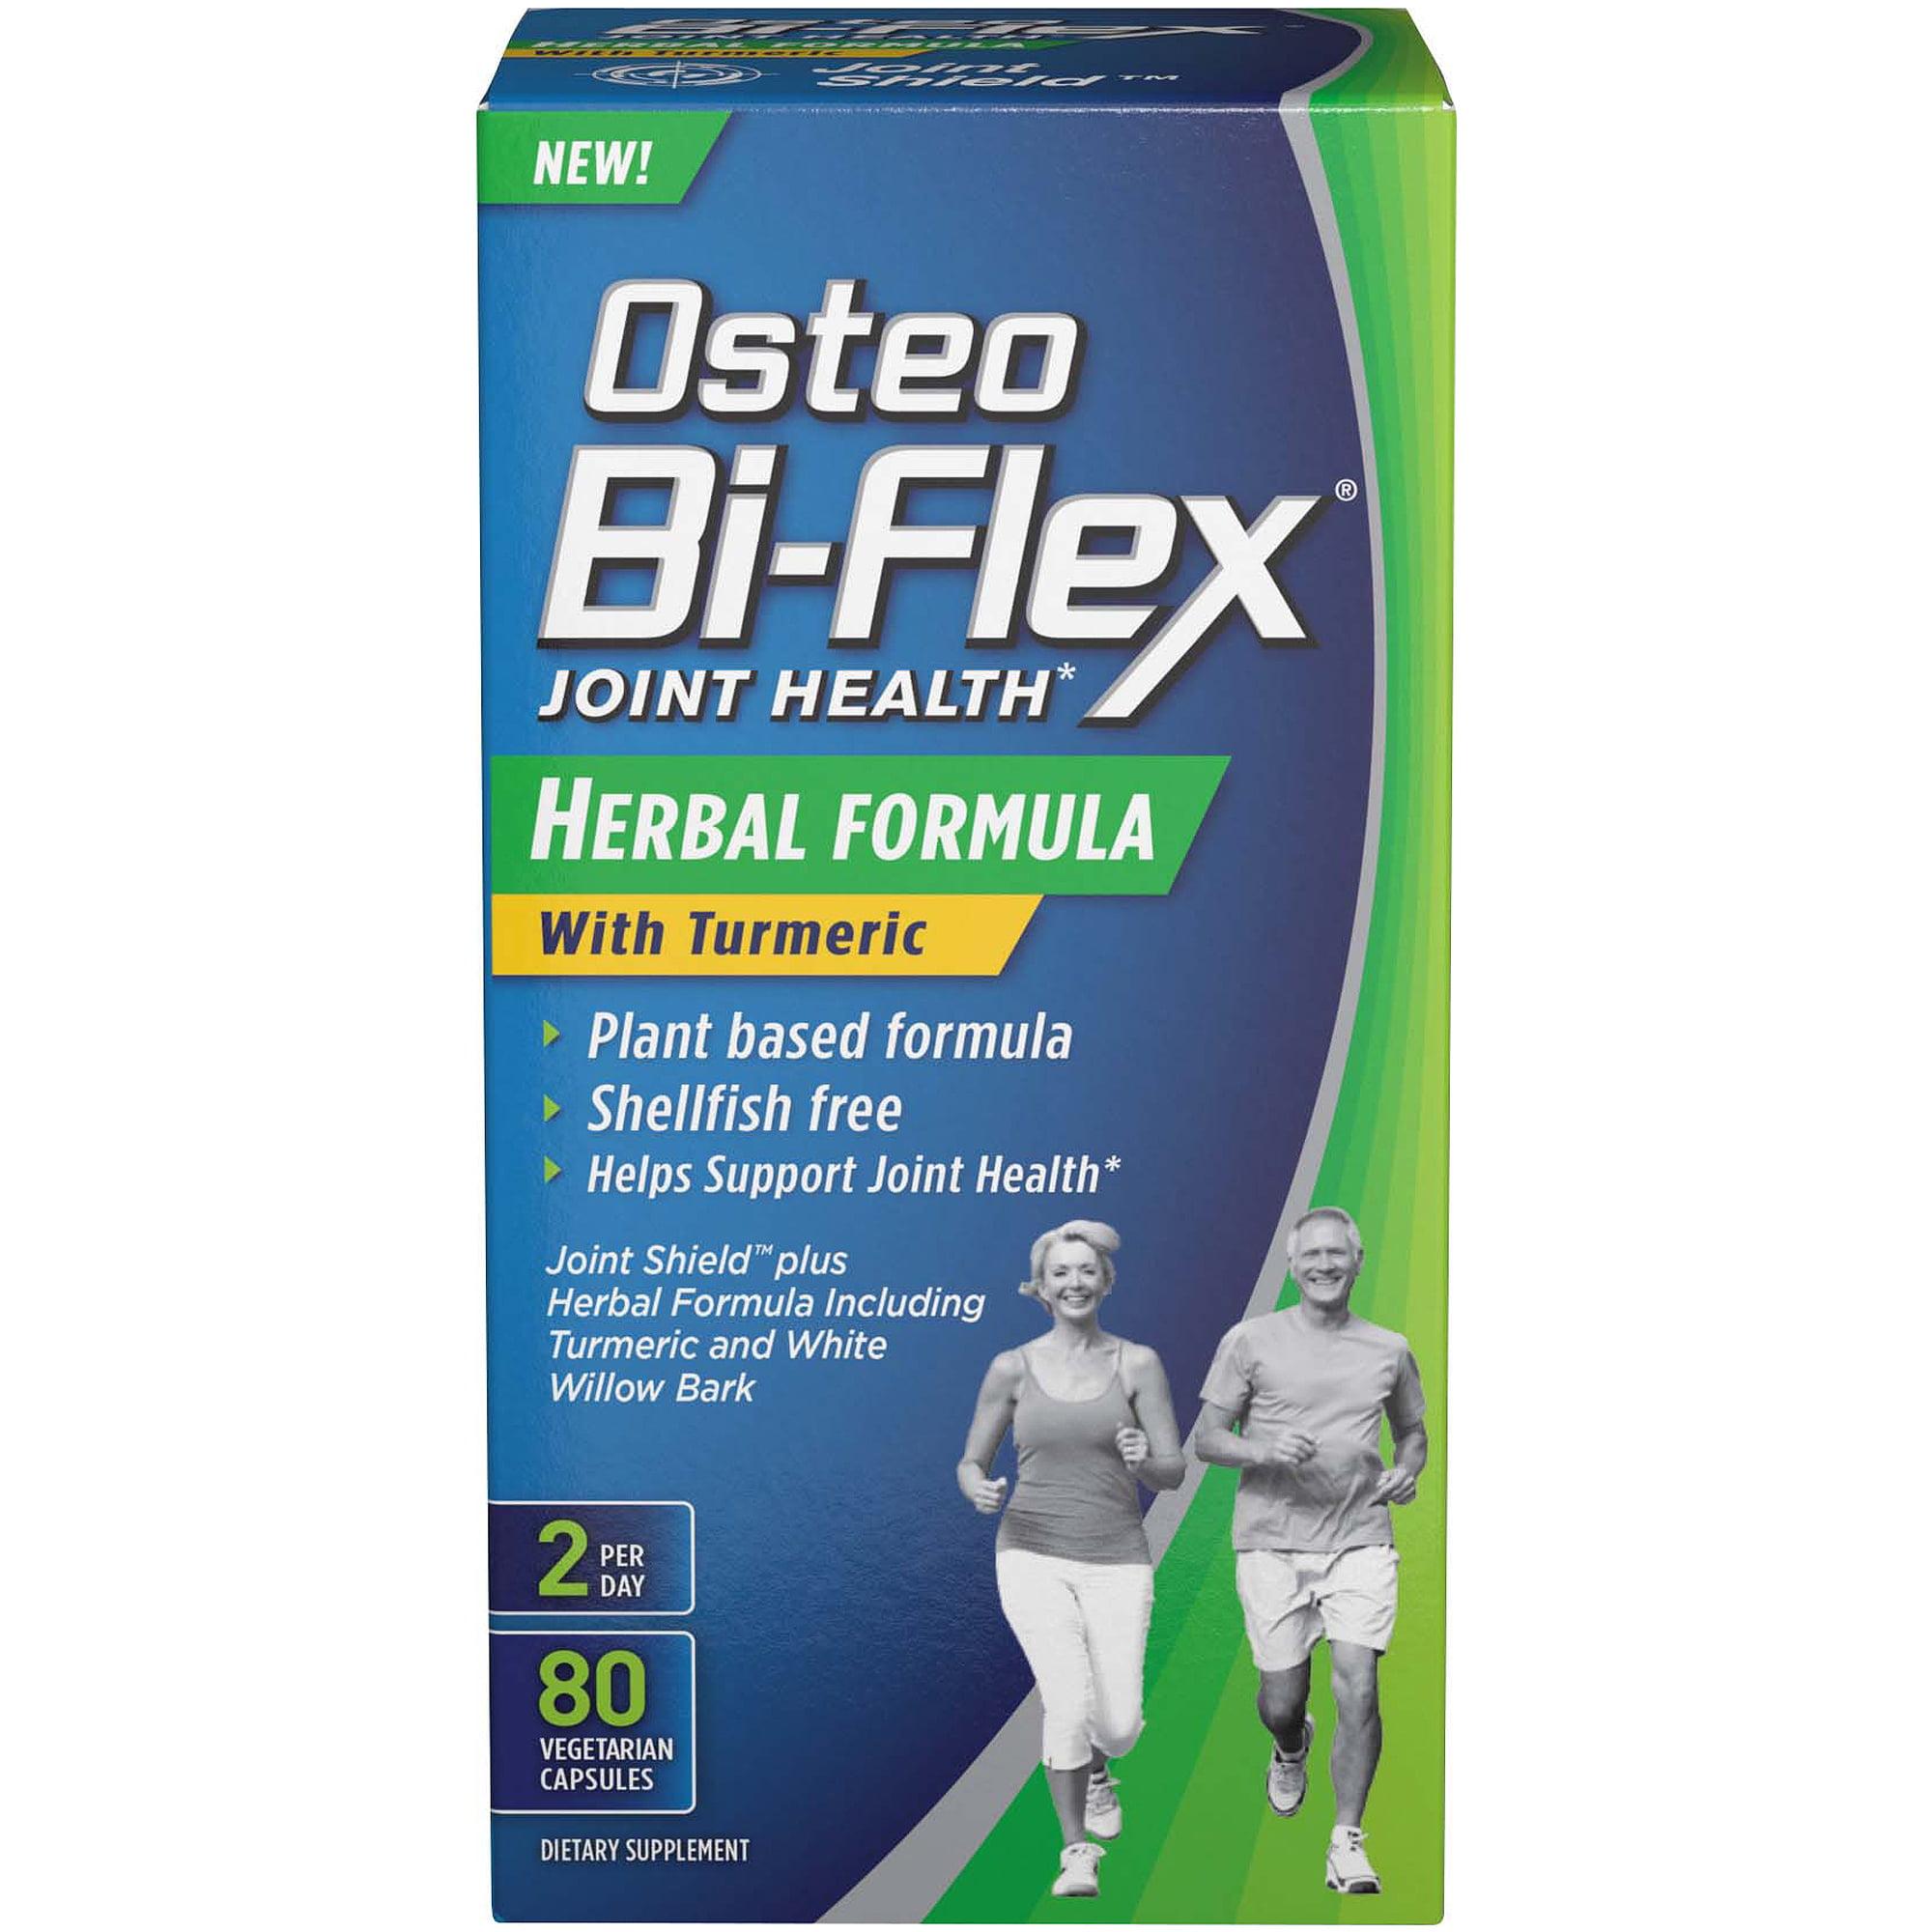 Osteo Bi-Flex - Joint Health Herbal Formula with Turmeric - 80 Capsules